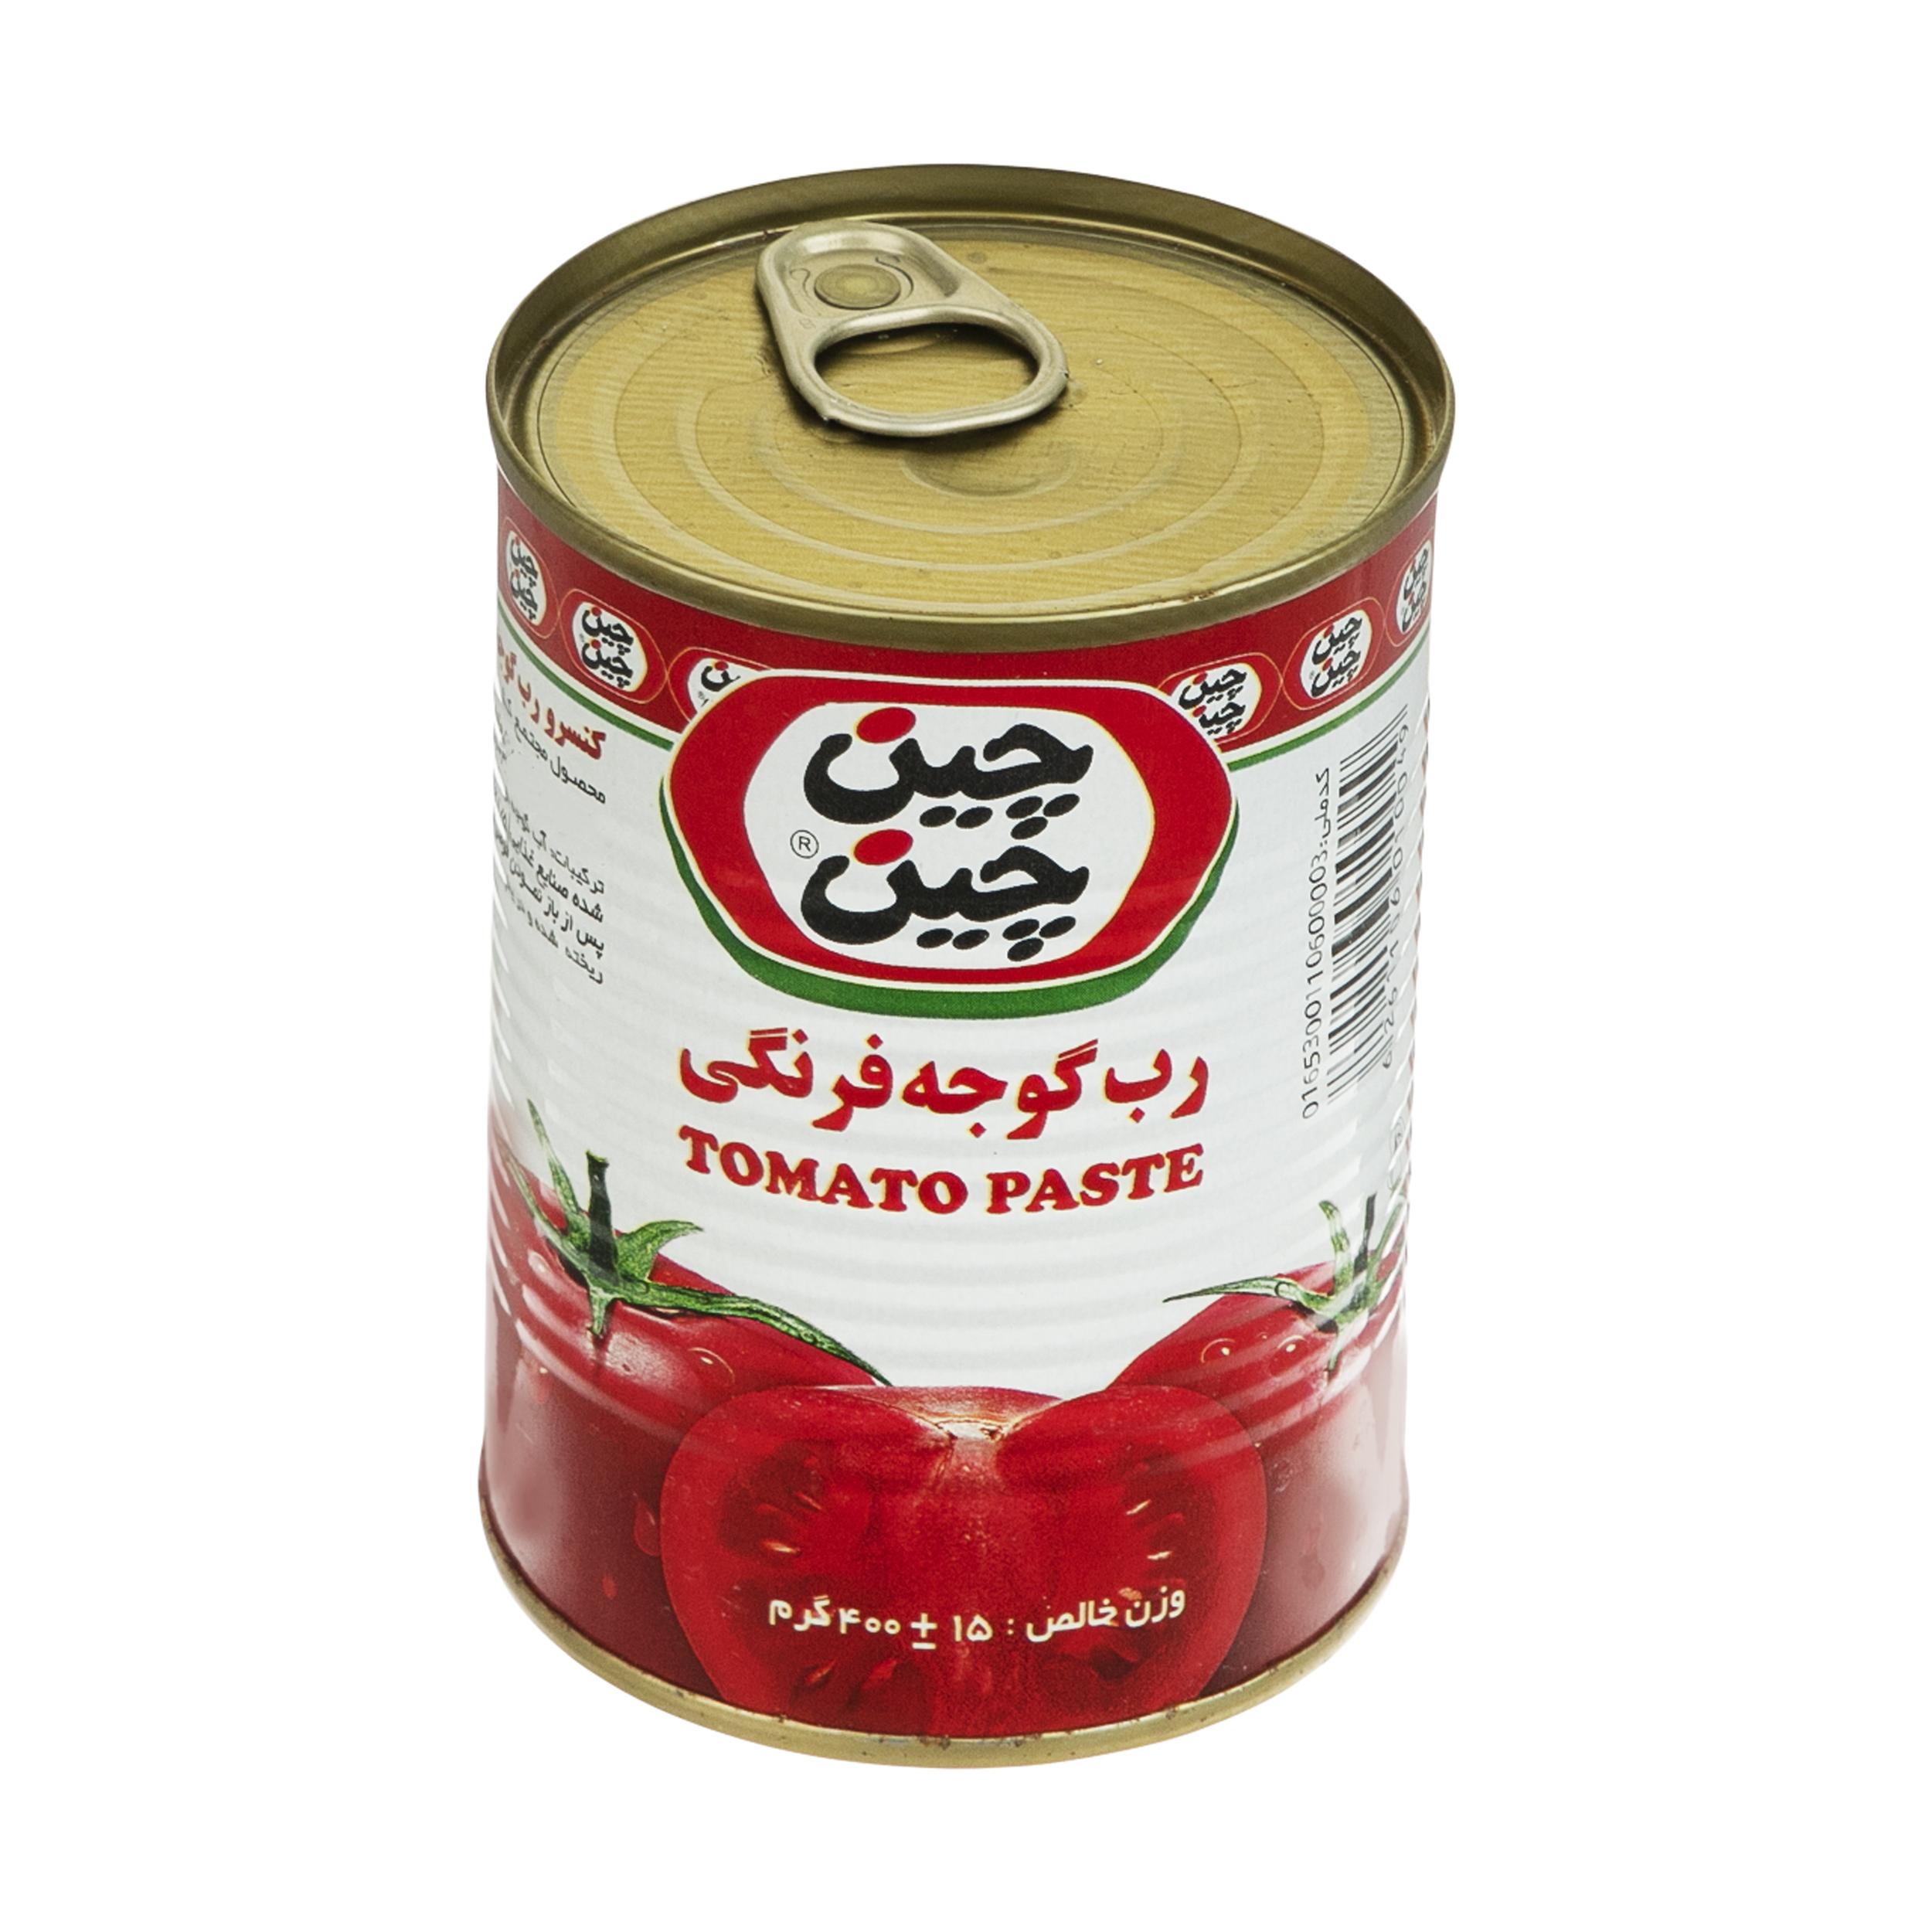 رب گوجه فرنگی چین چین - 400 گرم